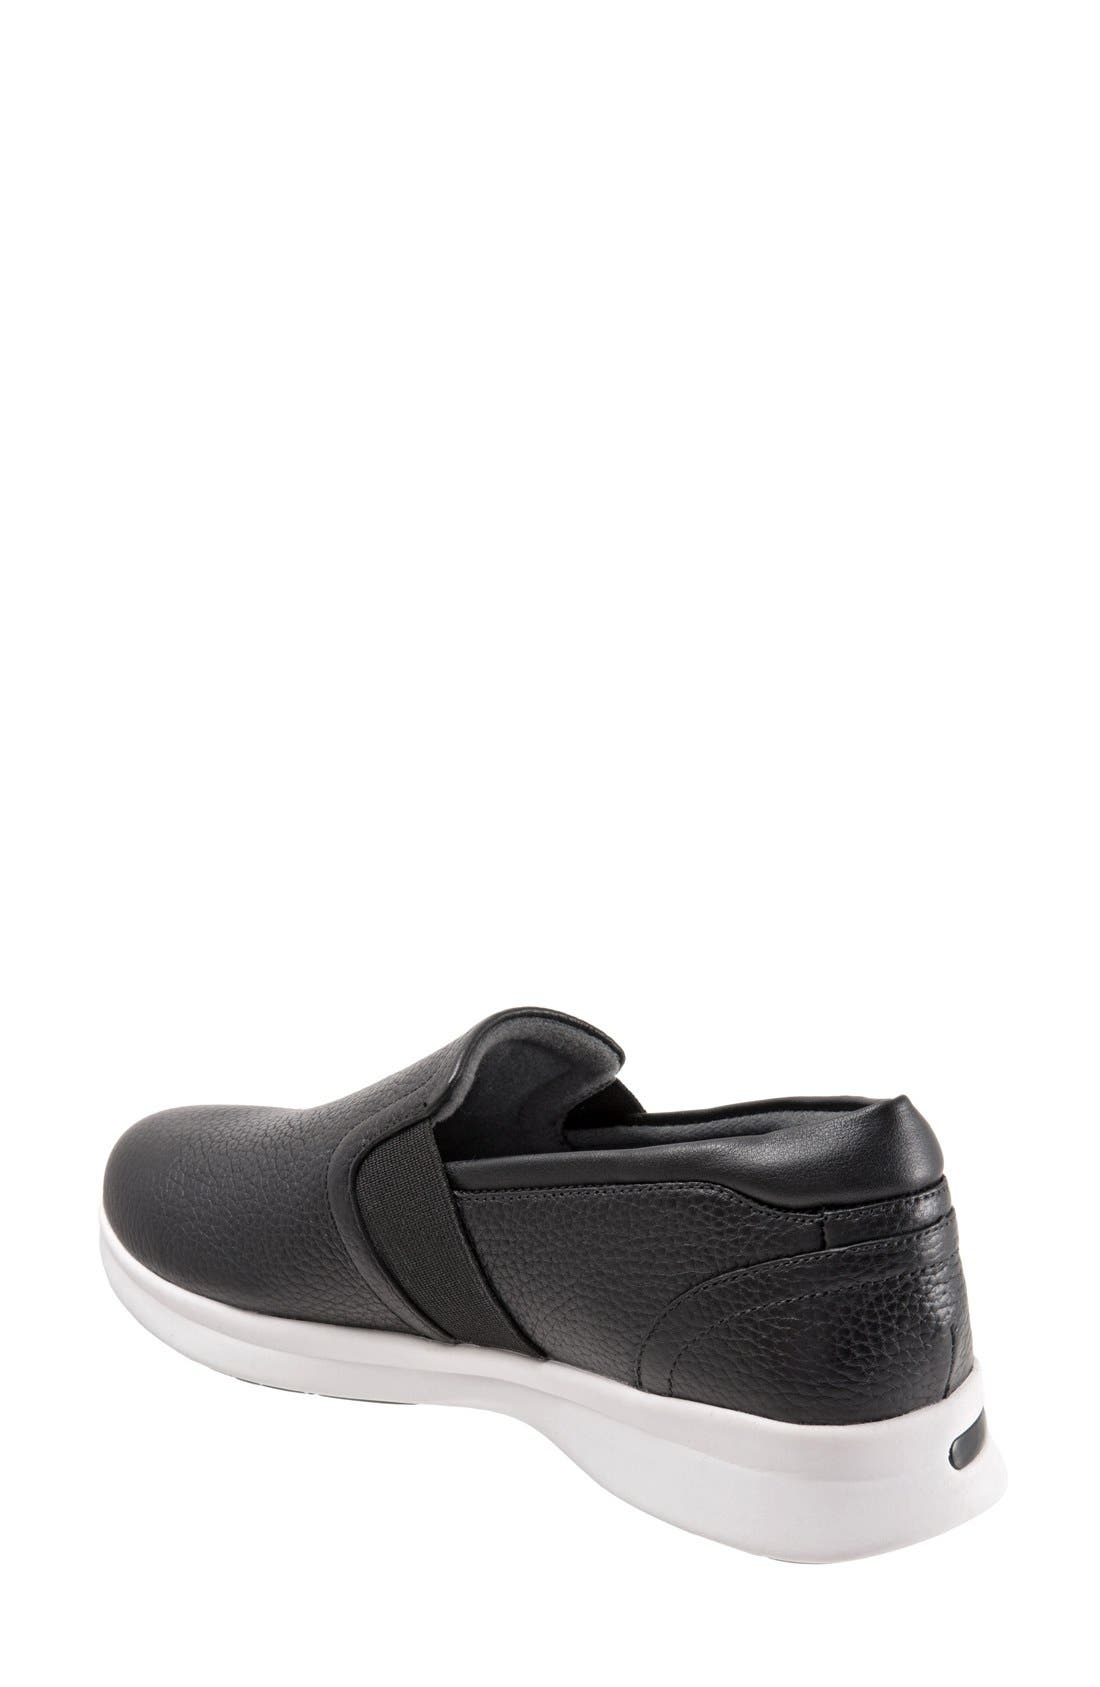 SOFTWALK<SUP>®</SUP>, 'Vantage' Slip-On Sneaker, Alternate thumbnail 2, color, BLACK / WHITE LEATHER